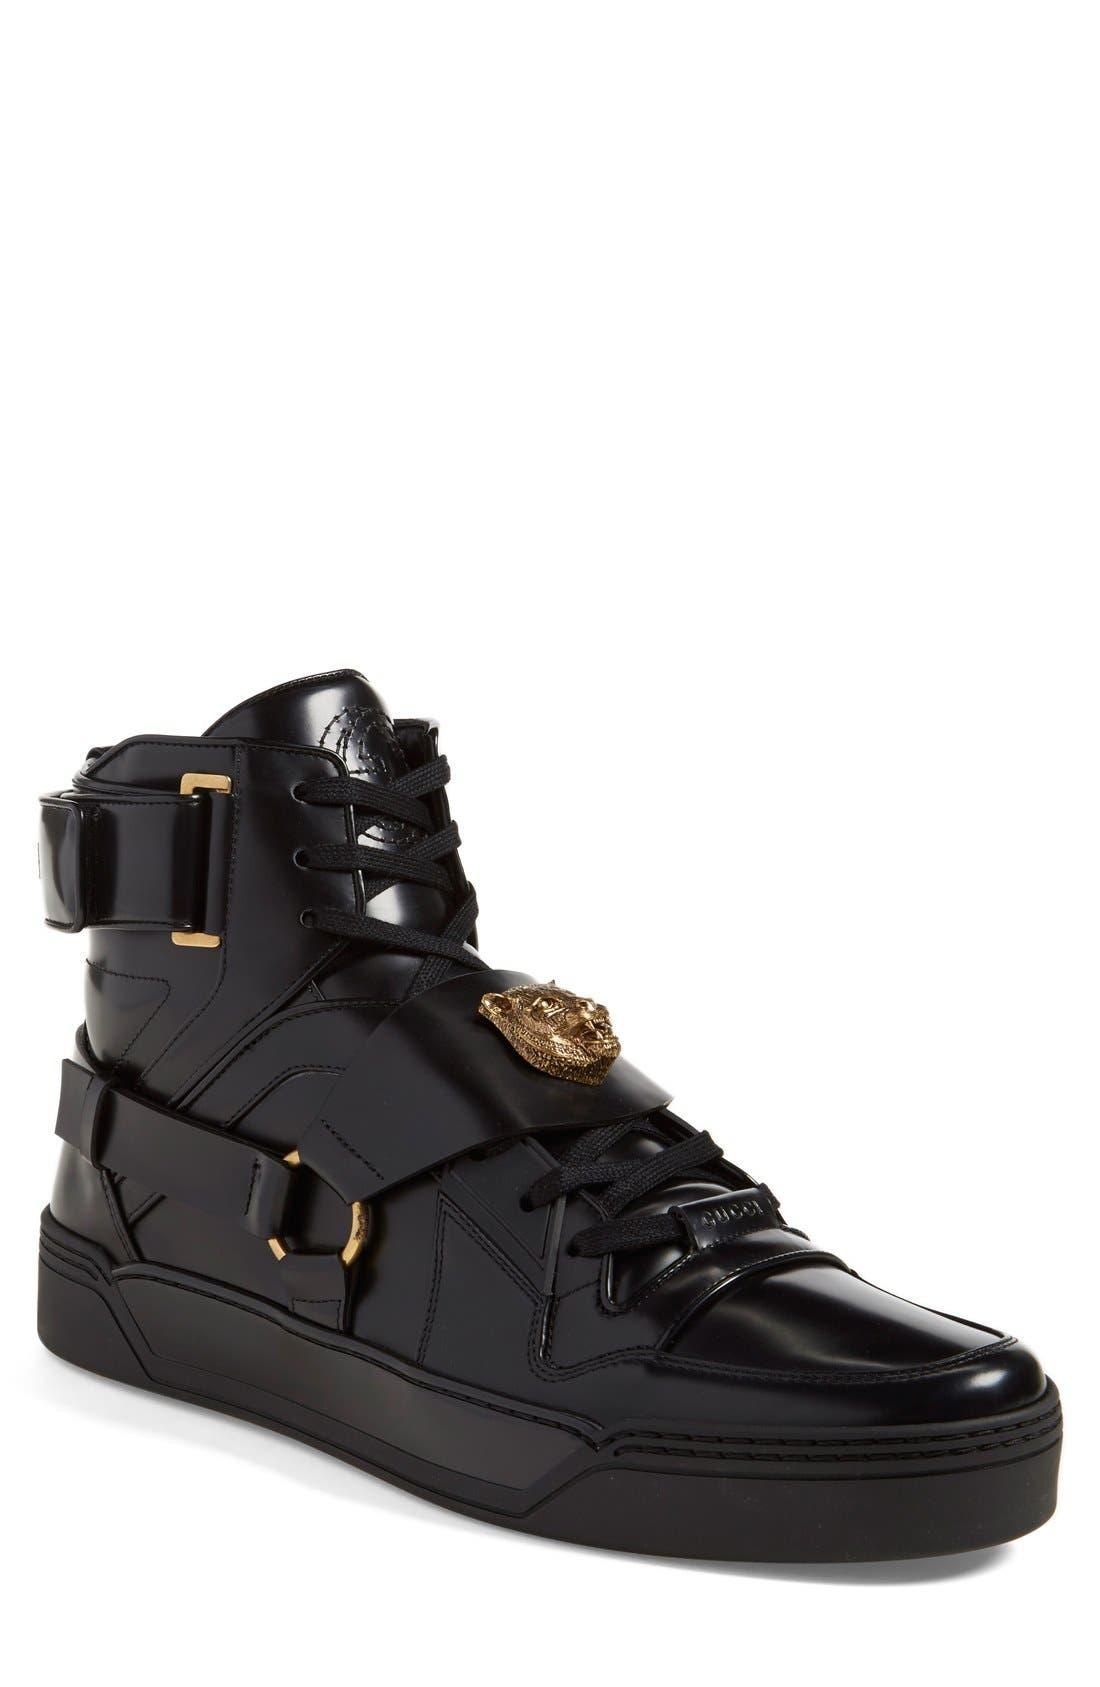 Main Image - Gucci 'Tiger' High Top Sneaker (Men)